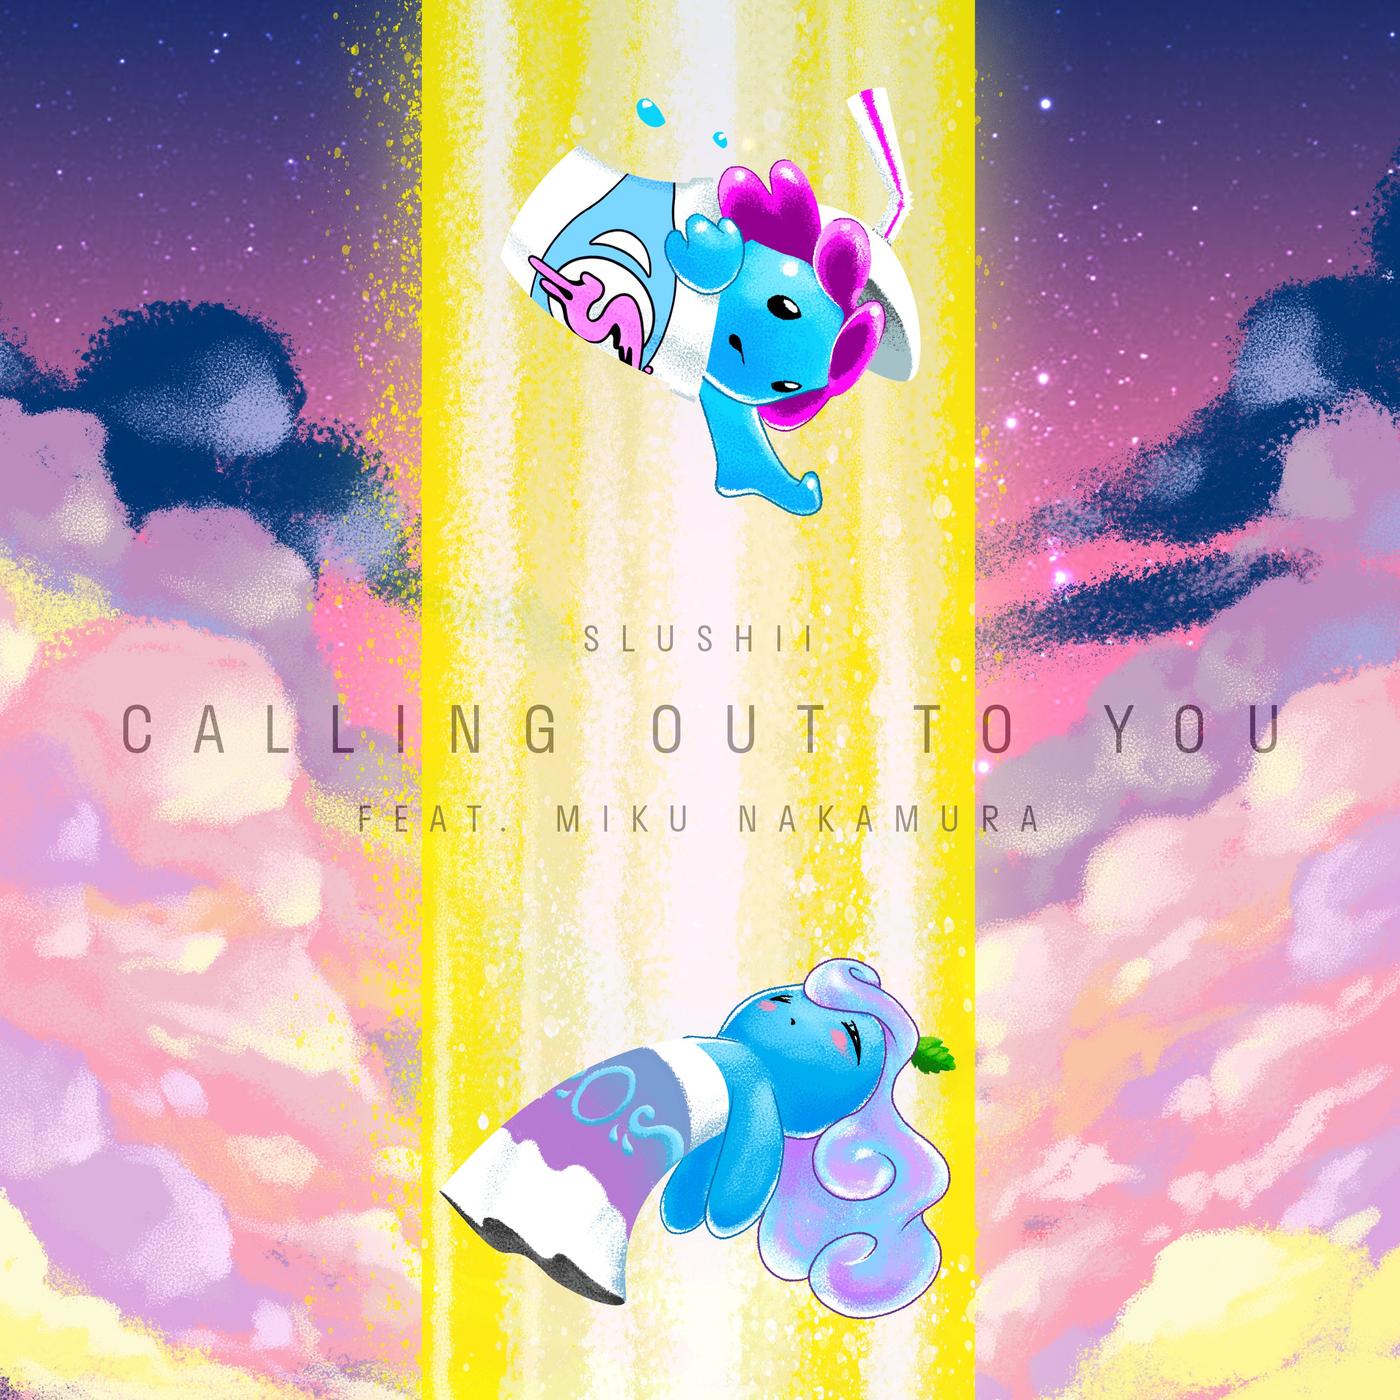 Calling Out to You (feat. Miku Nakamura) [Co shu Nie] - Slushii